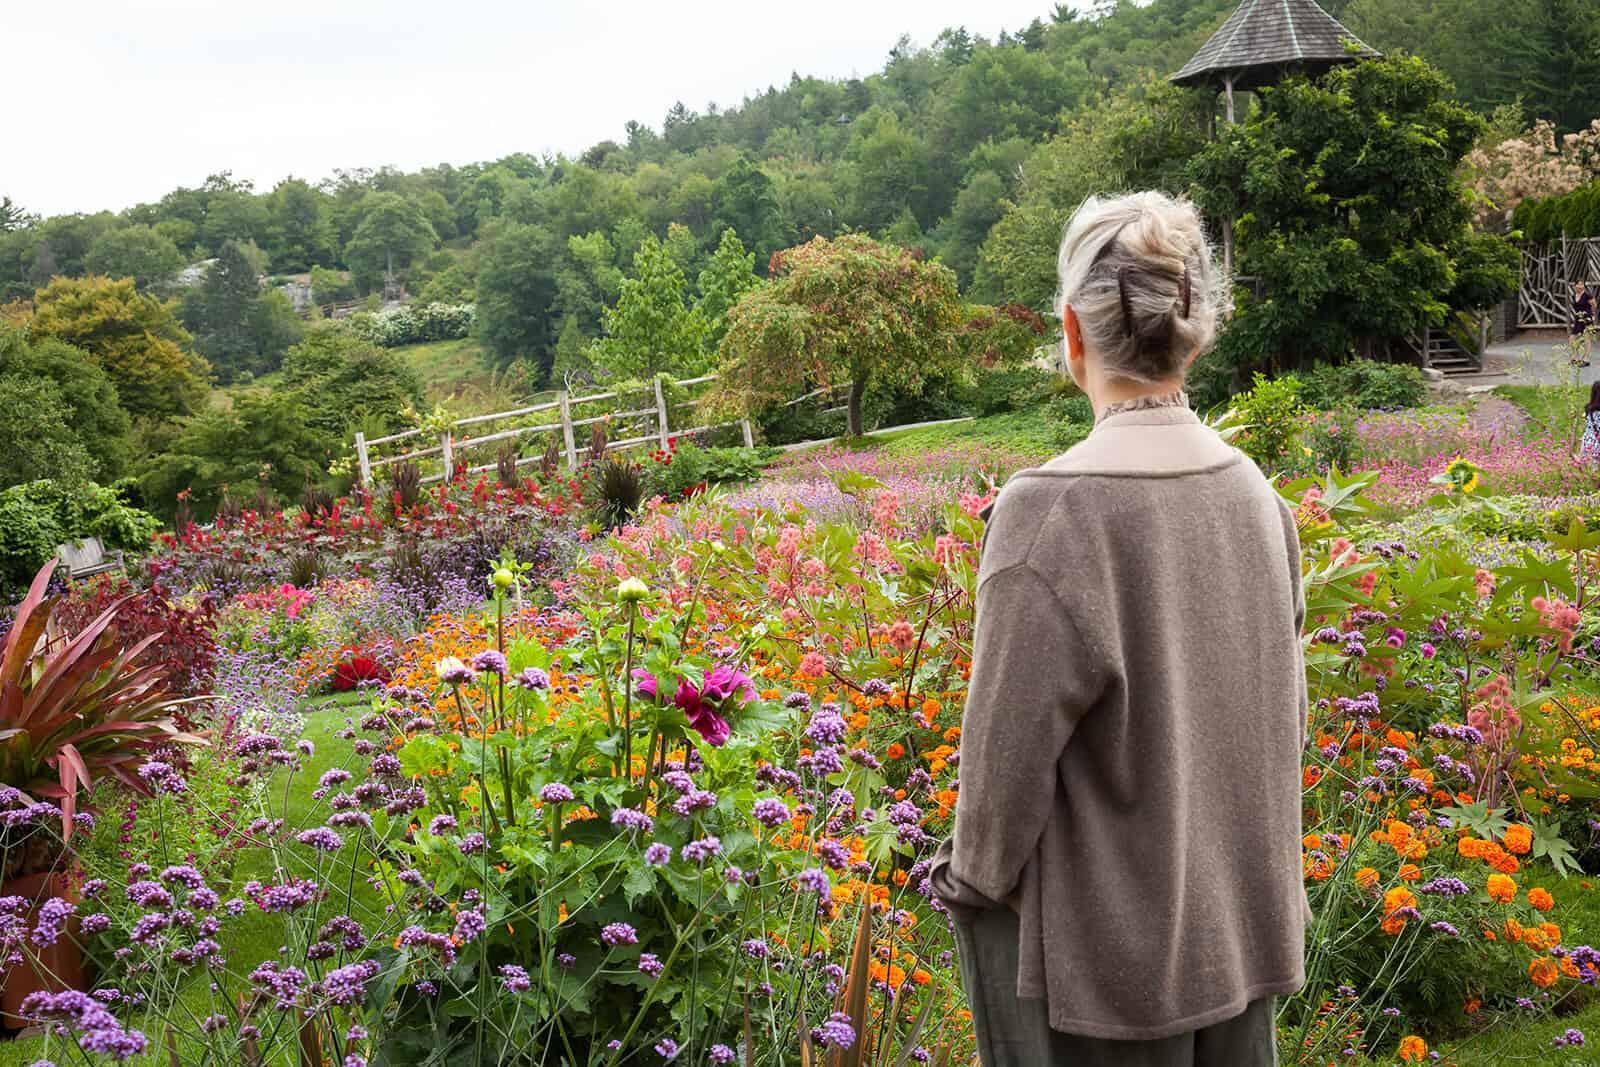 Mohonk Gardens - Hudson Valley Getaway - Upstate New York